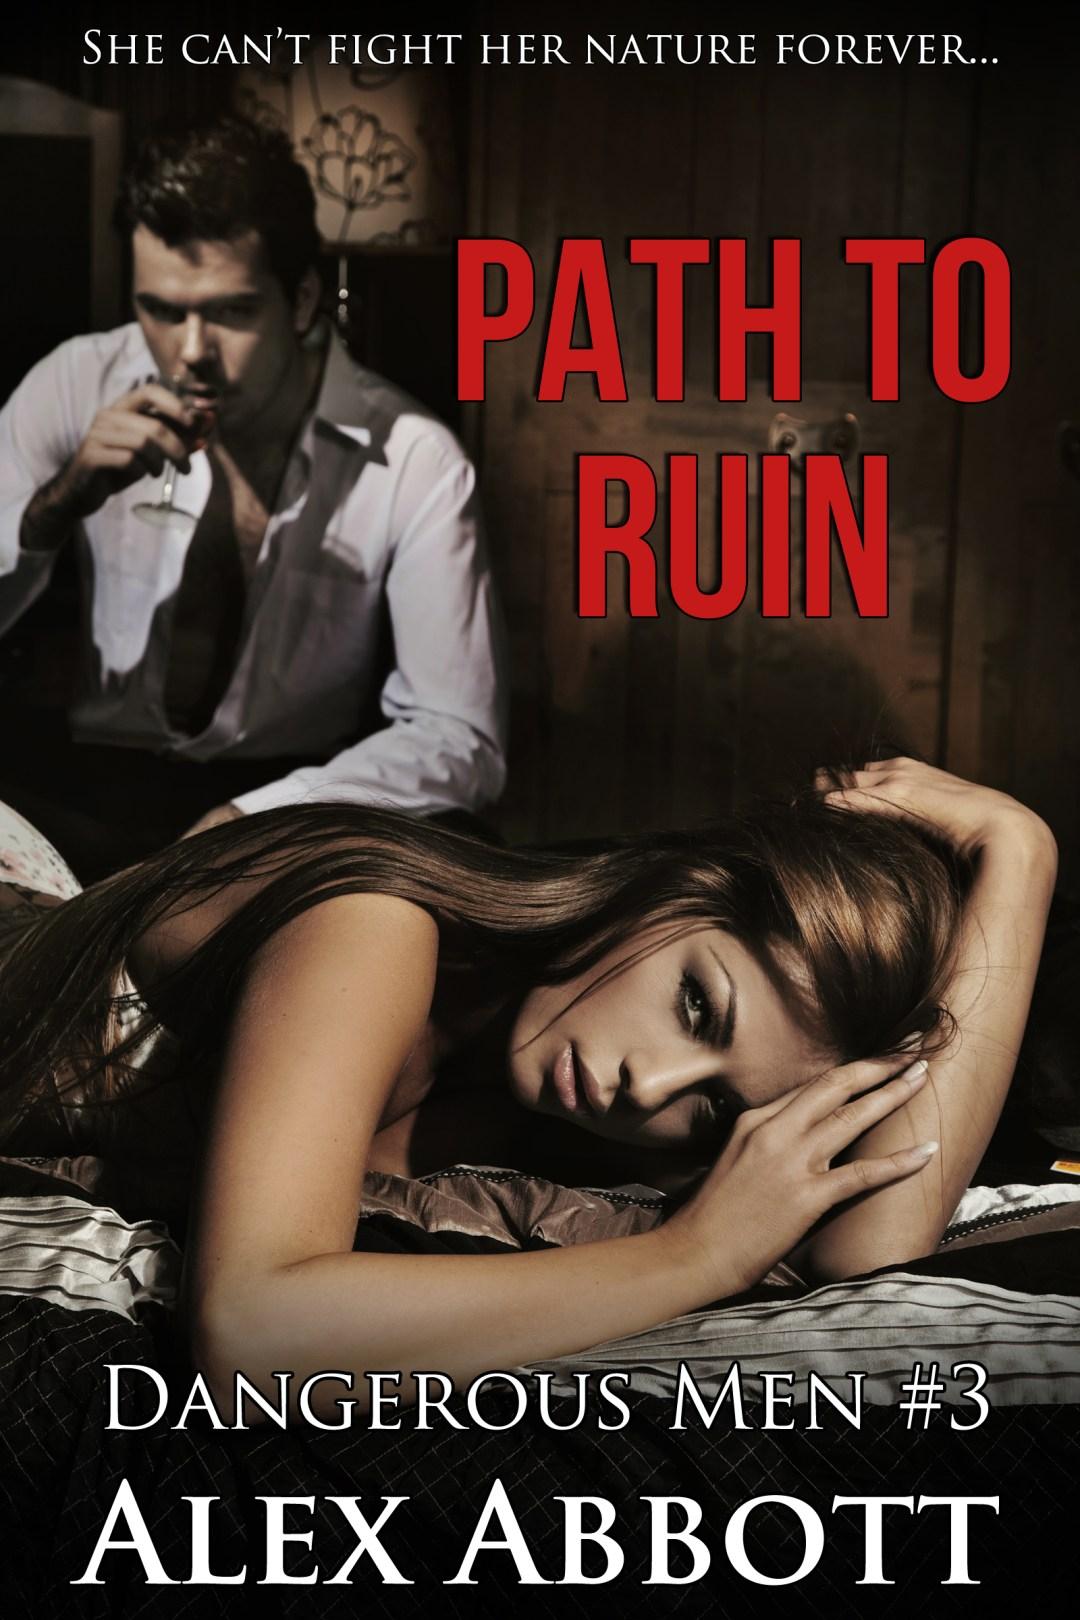 Alexis Abbott - Path to Ruin